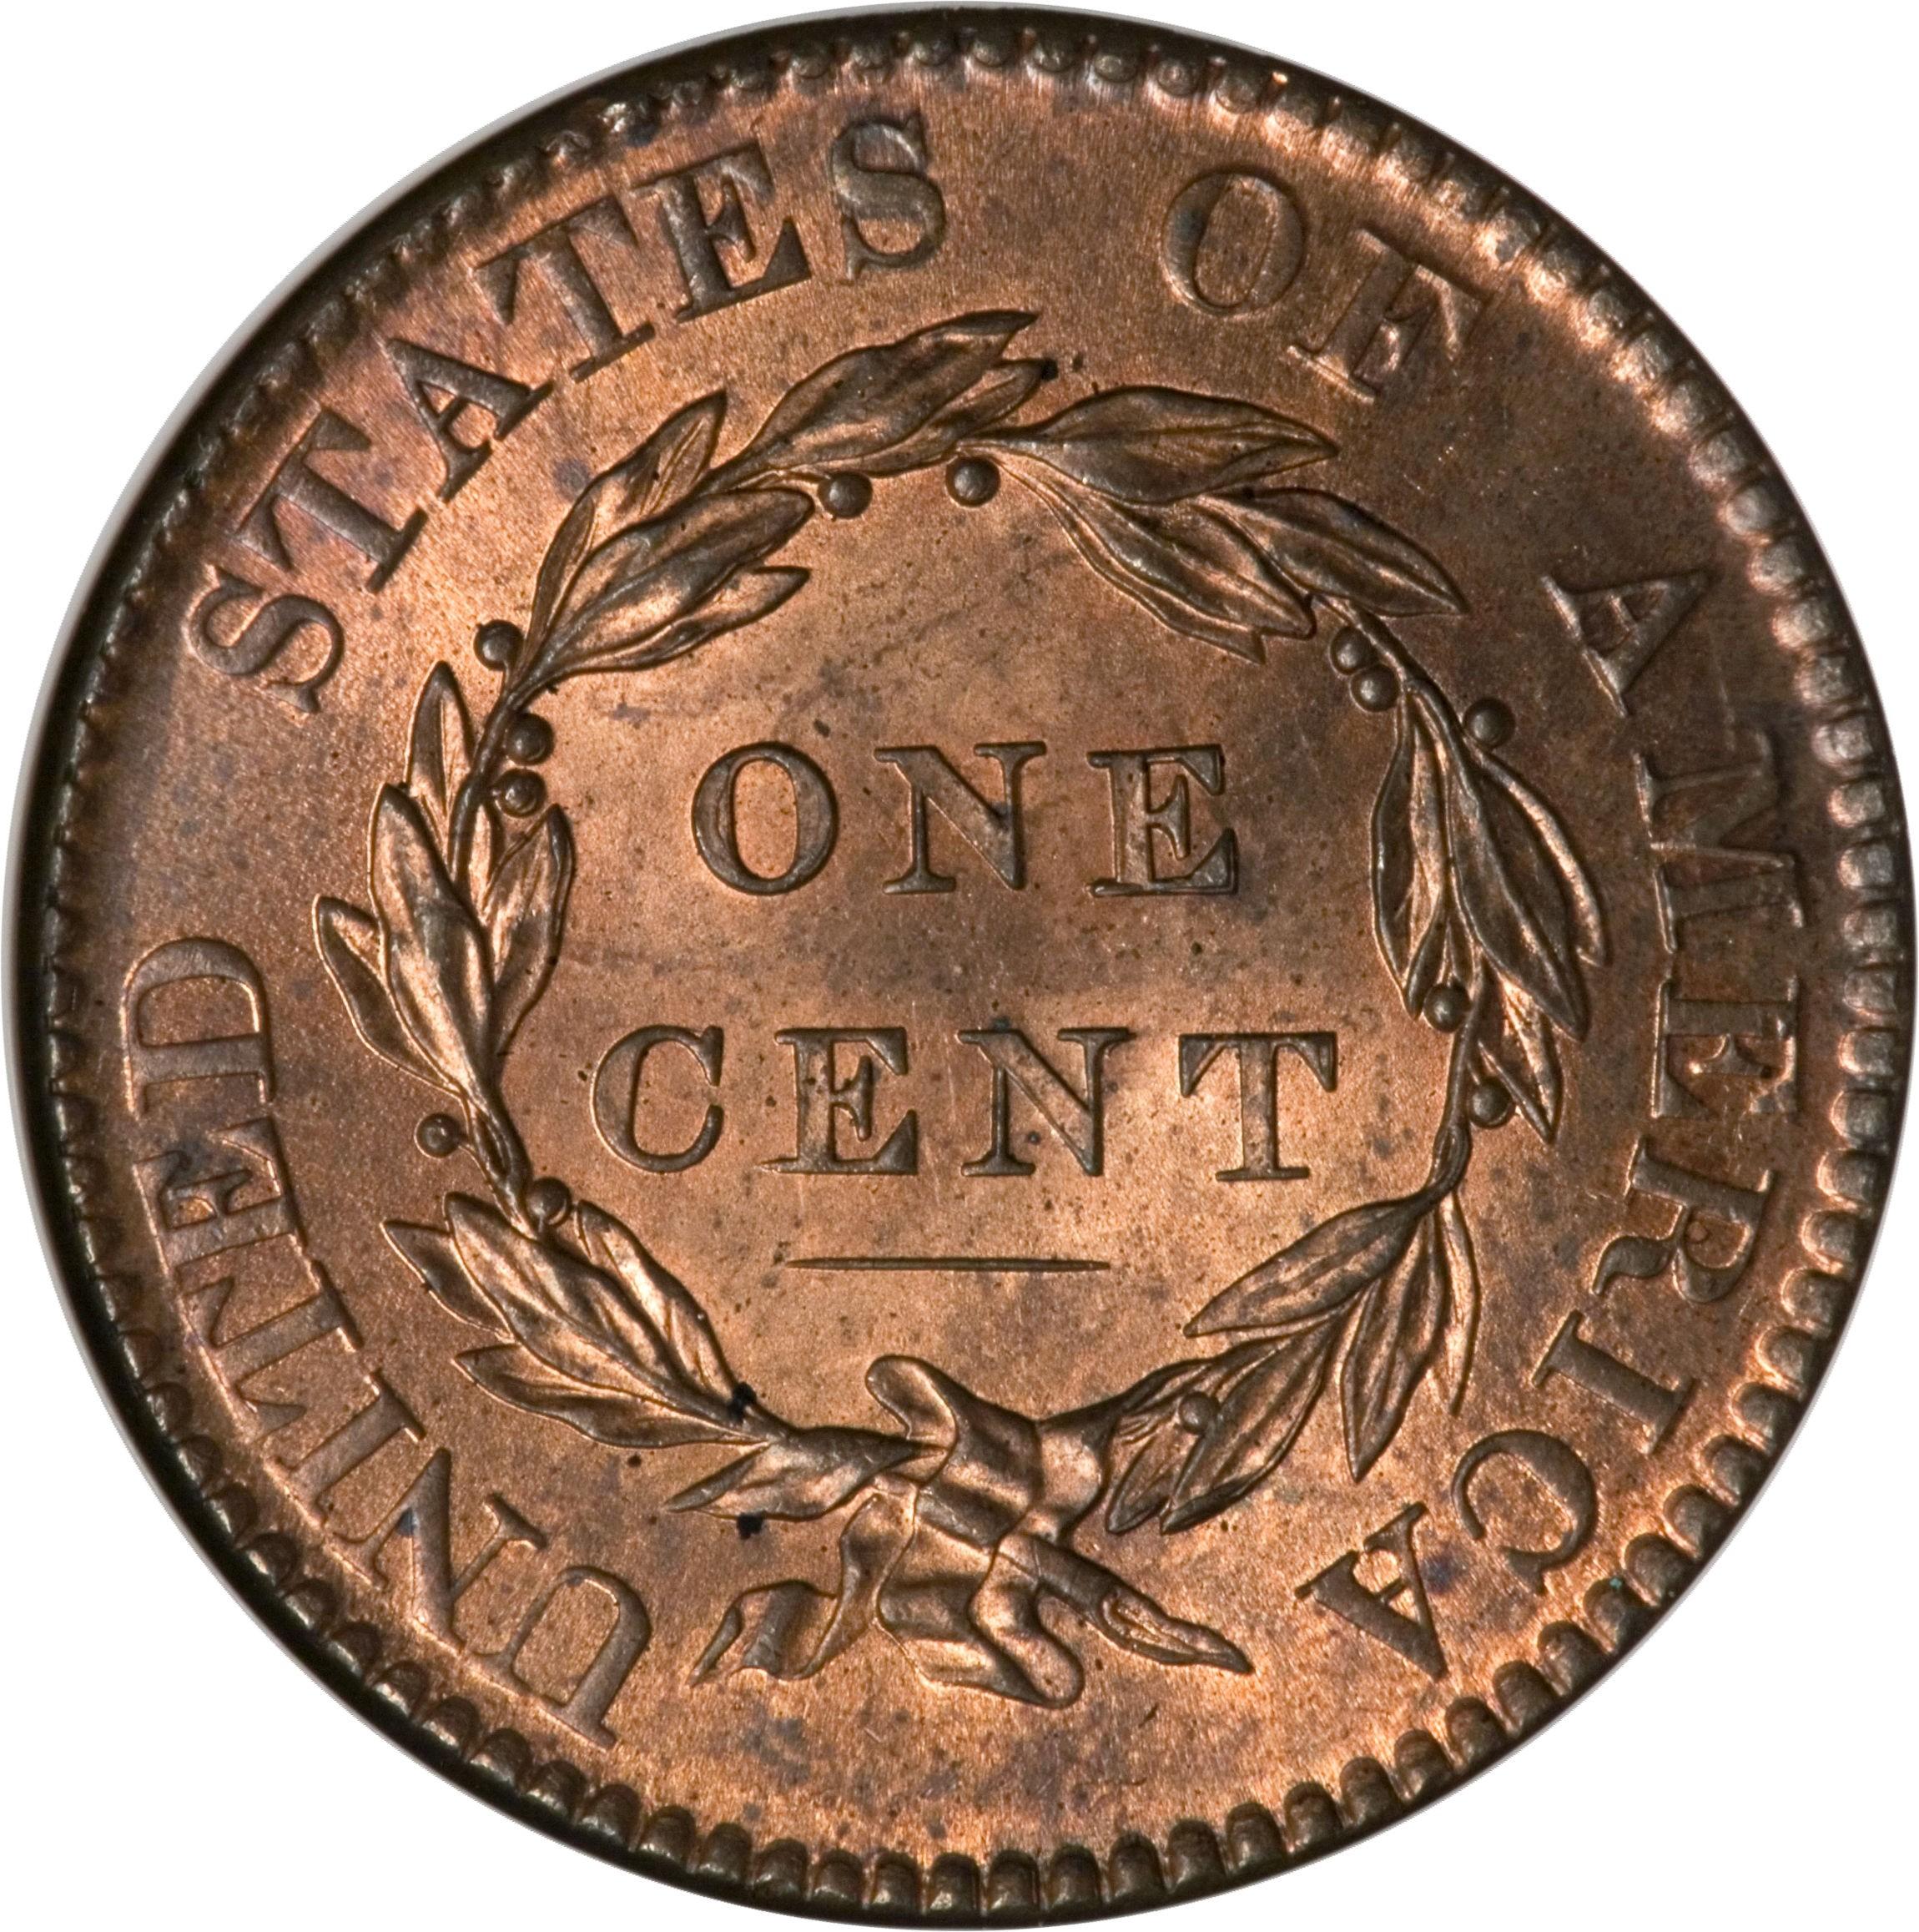 United States 1 Cent (1816-1836 Liberty Head / Matron Head)